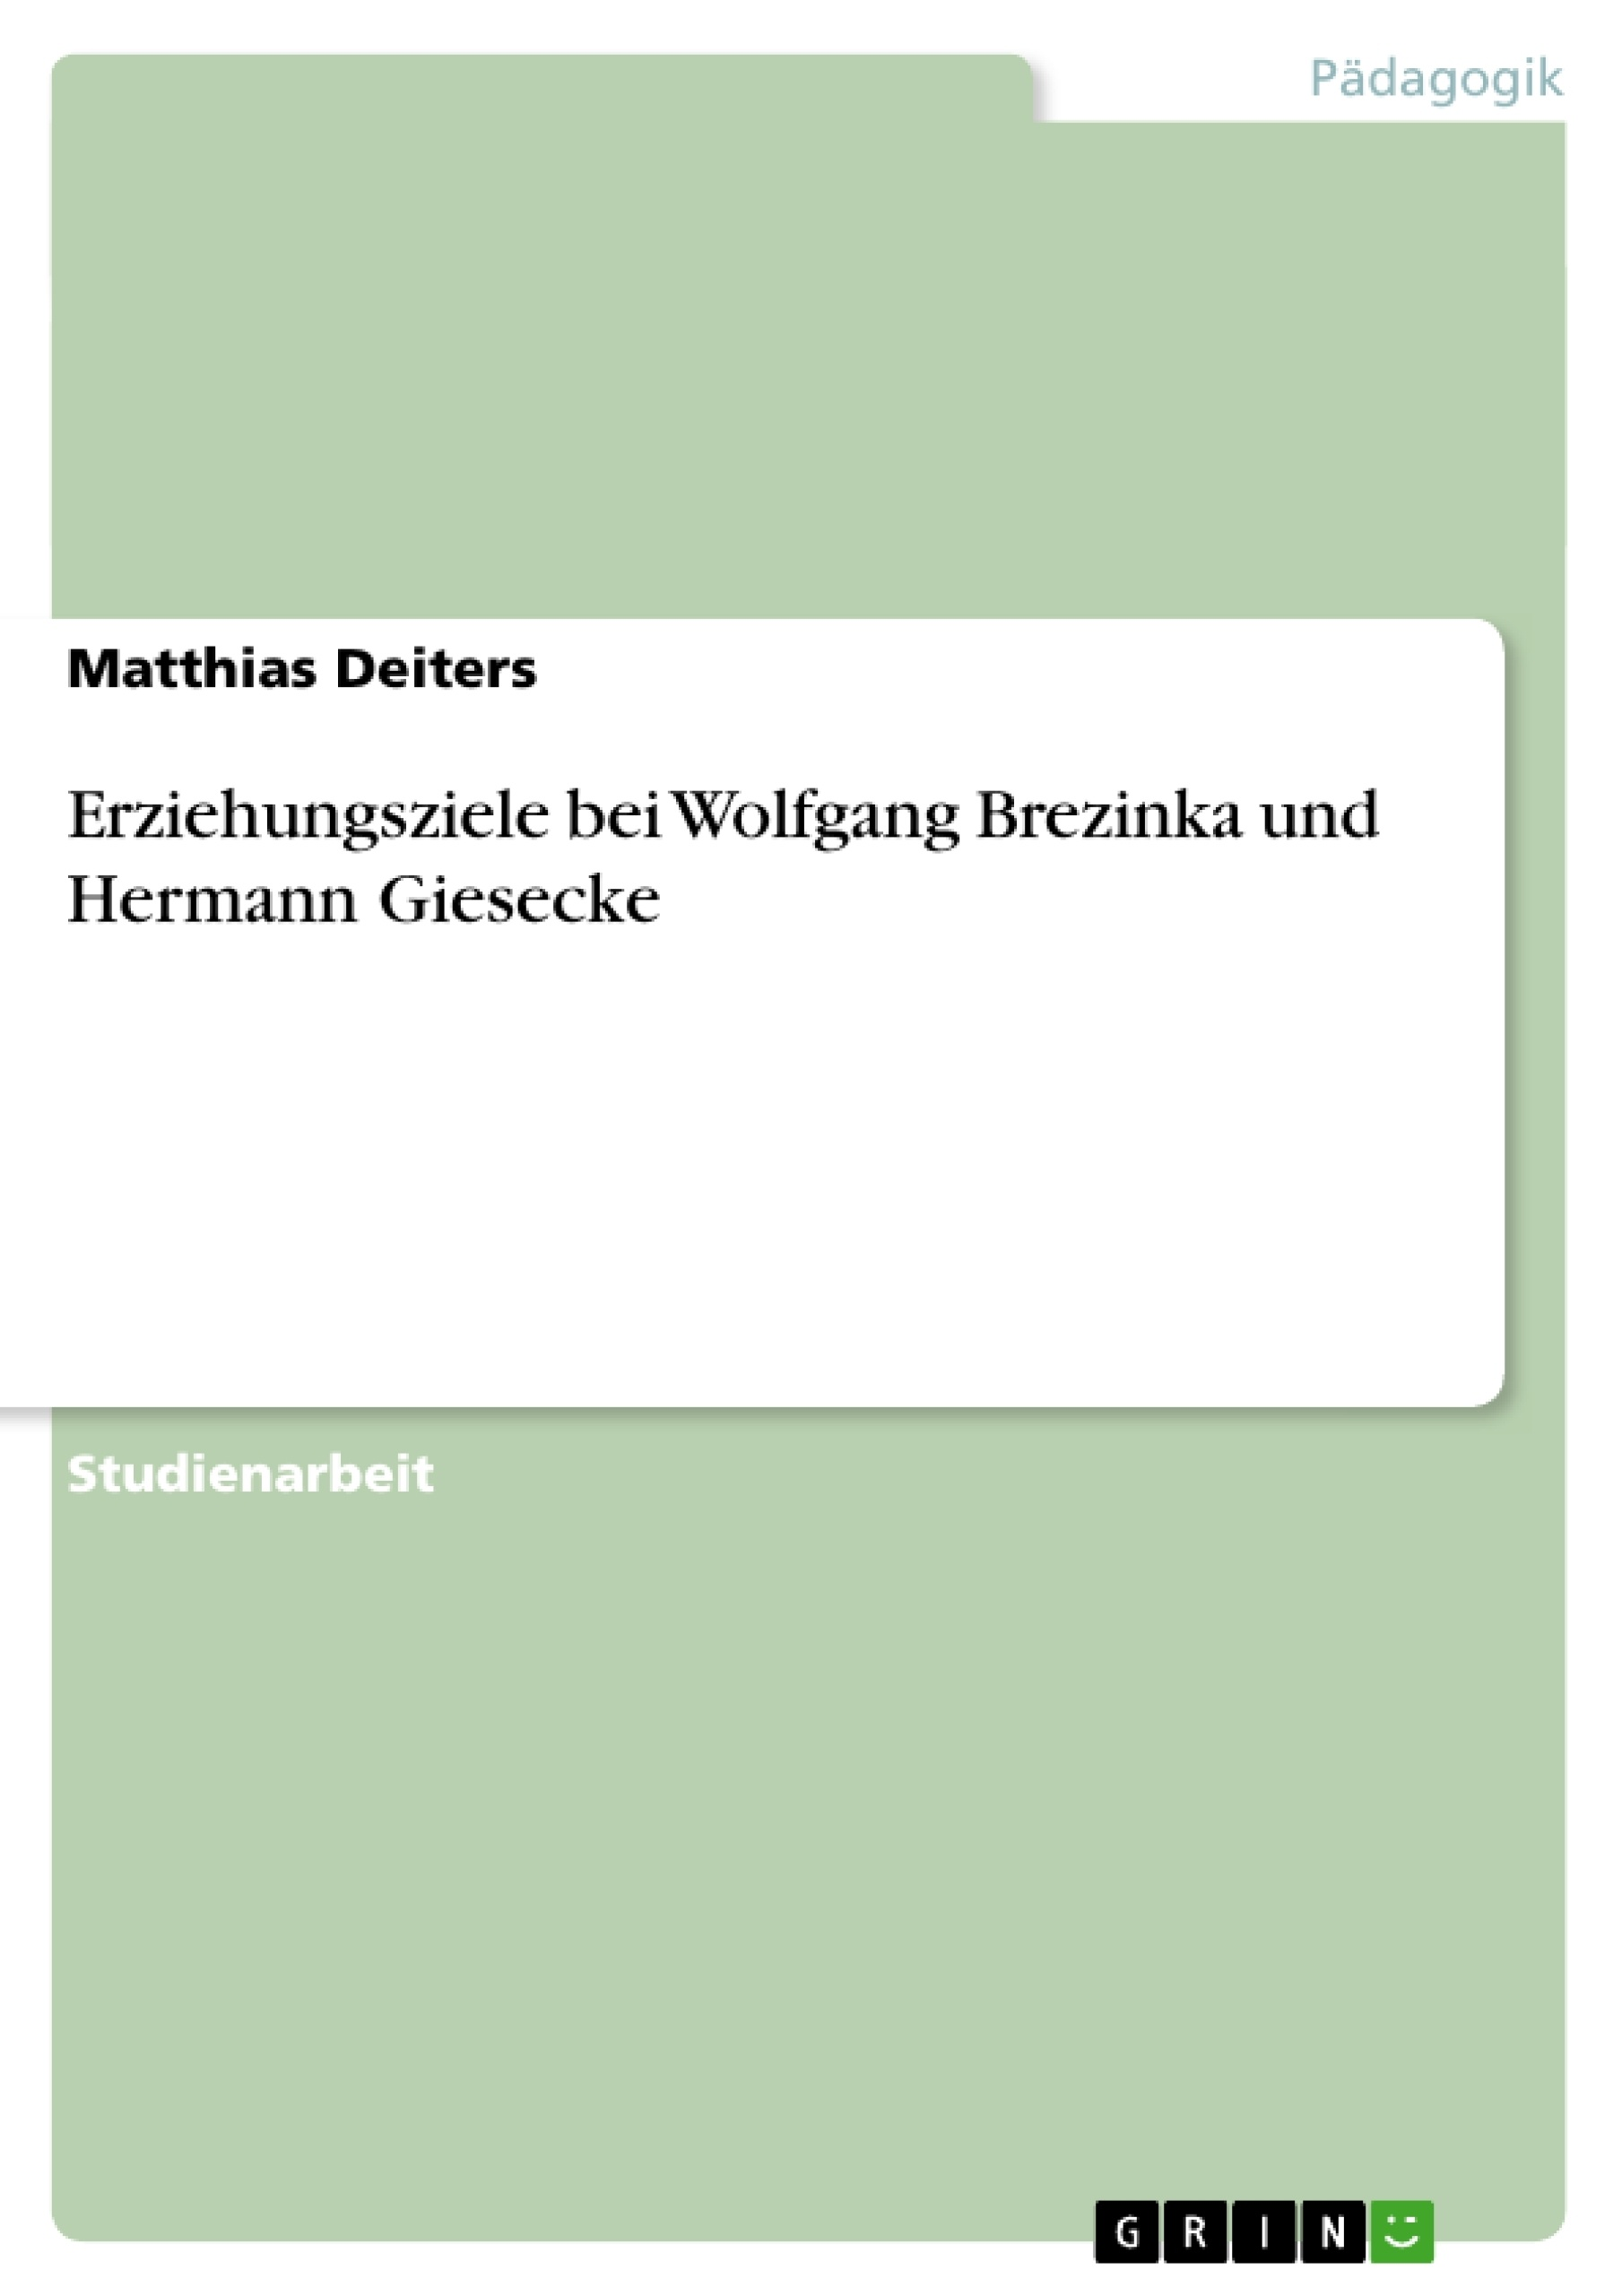 Titel: Erziehungsziele bei Wolfgang Brezinka und Hermann Giesecke